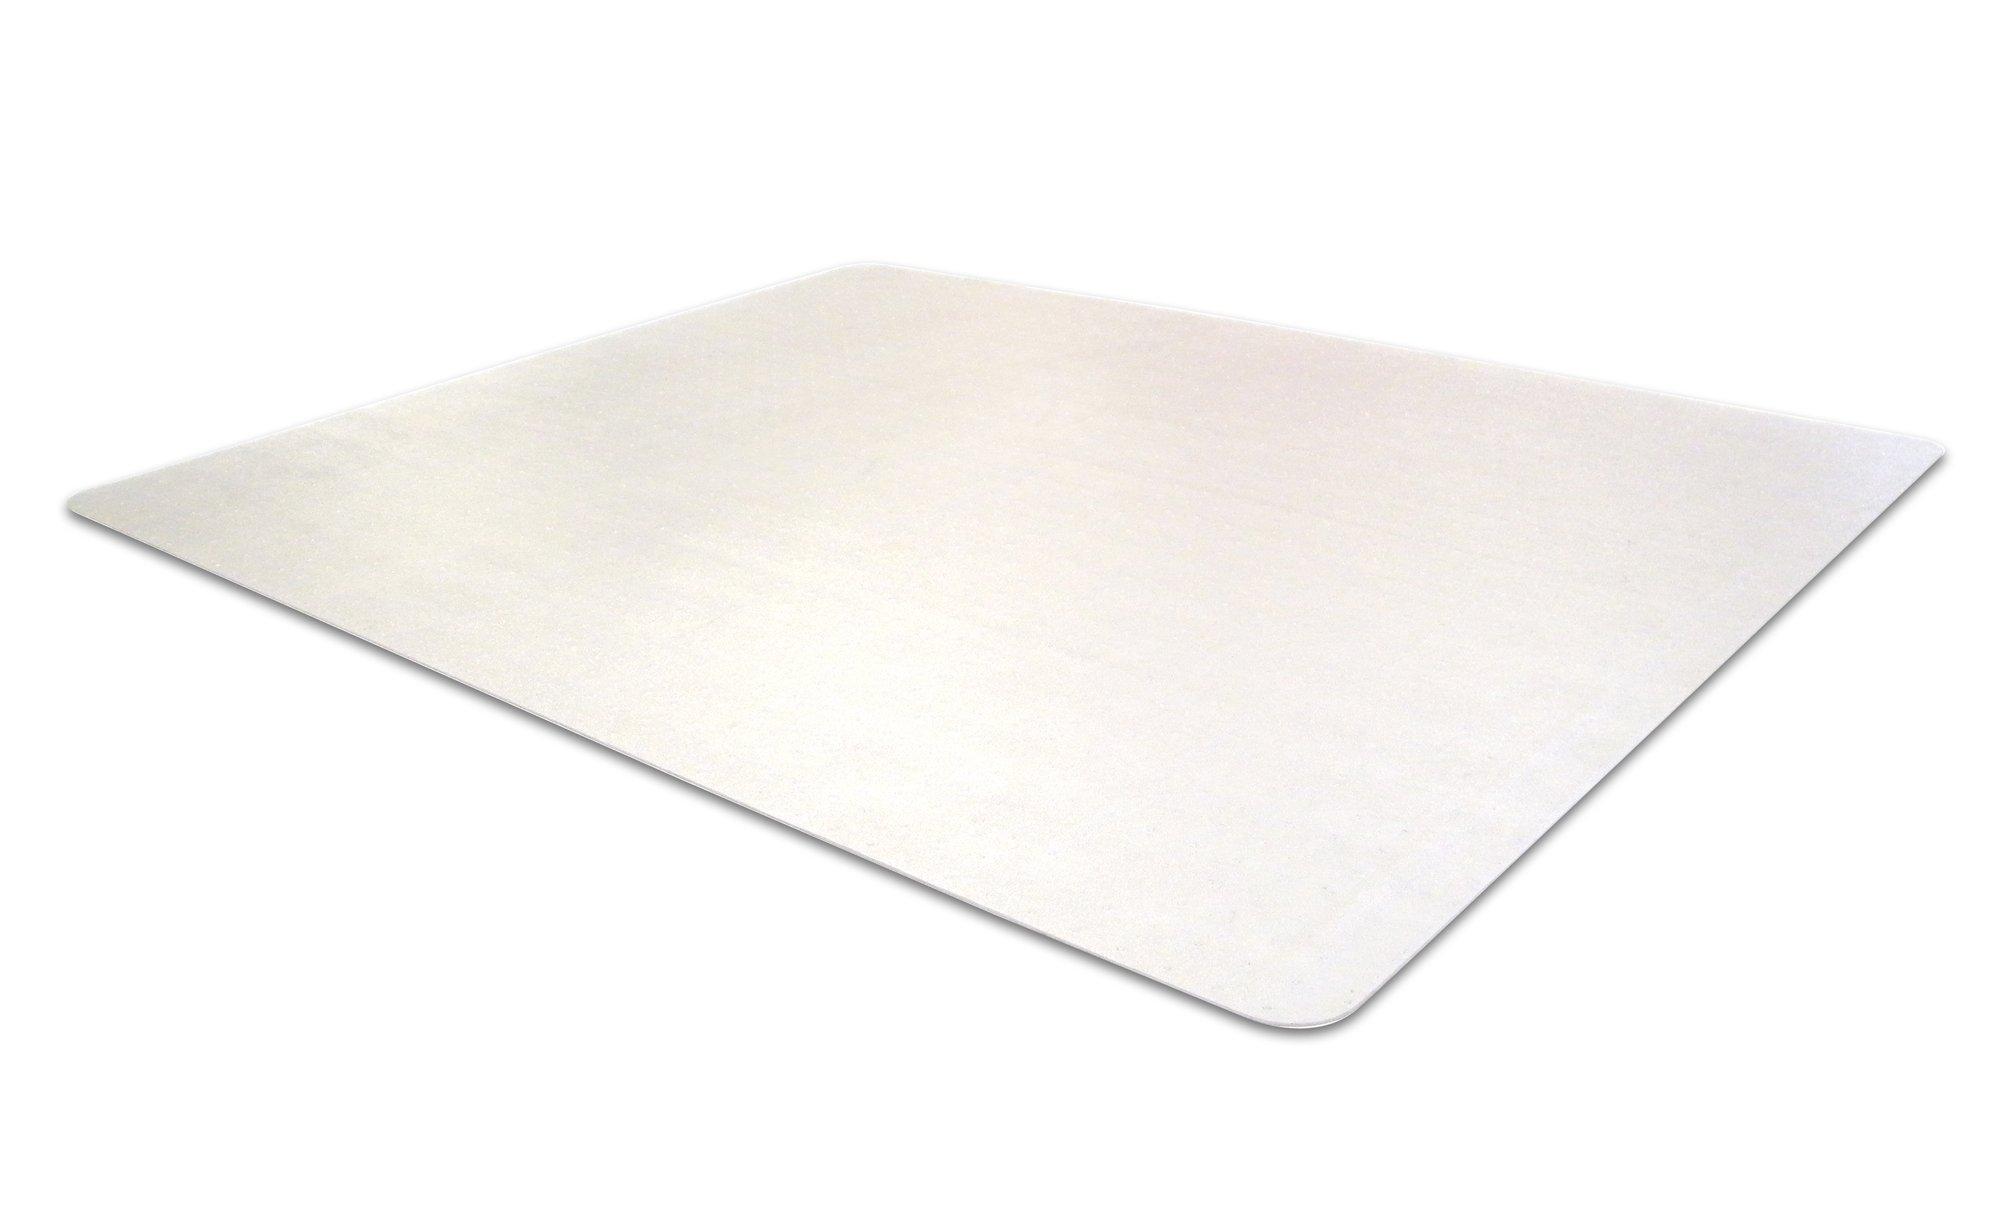 Cleartex Advantagemat Chair Mat for Carpets 1/4'' or Less, Clear PVC, Rectangular, 48'' x 79'' (FR1120025EV)